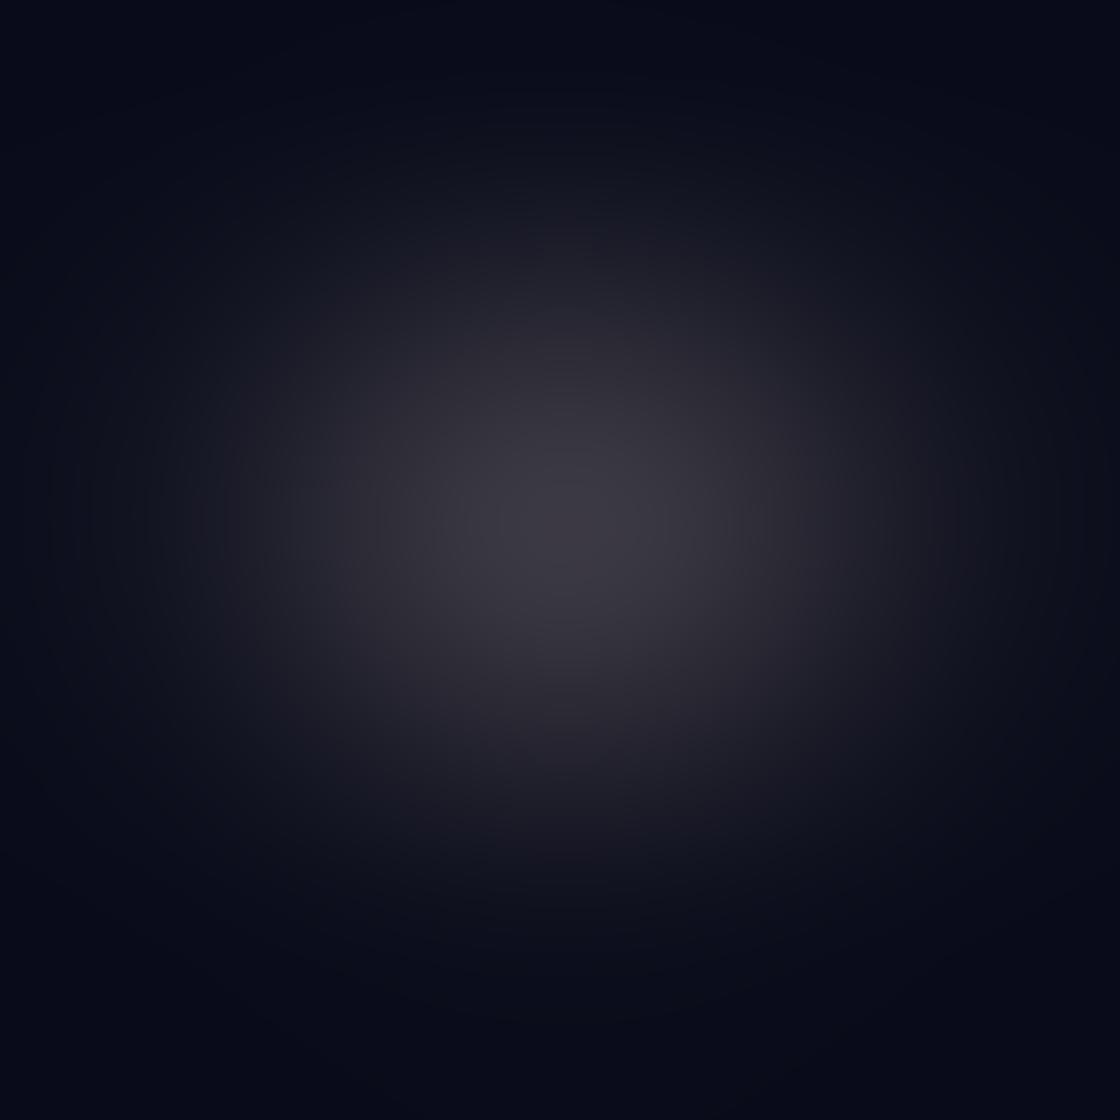 iPhone Photo Shadows 29